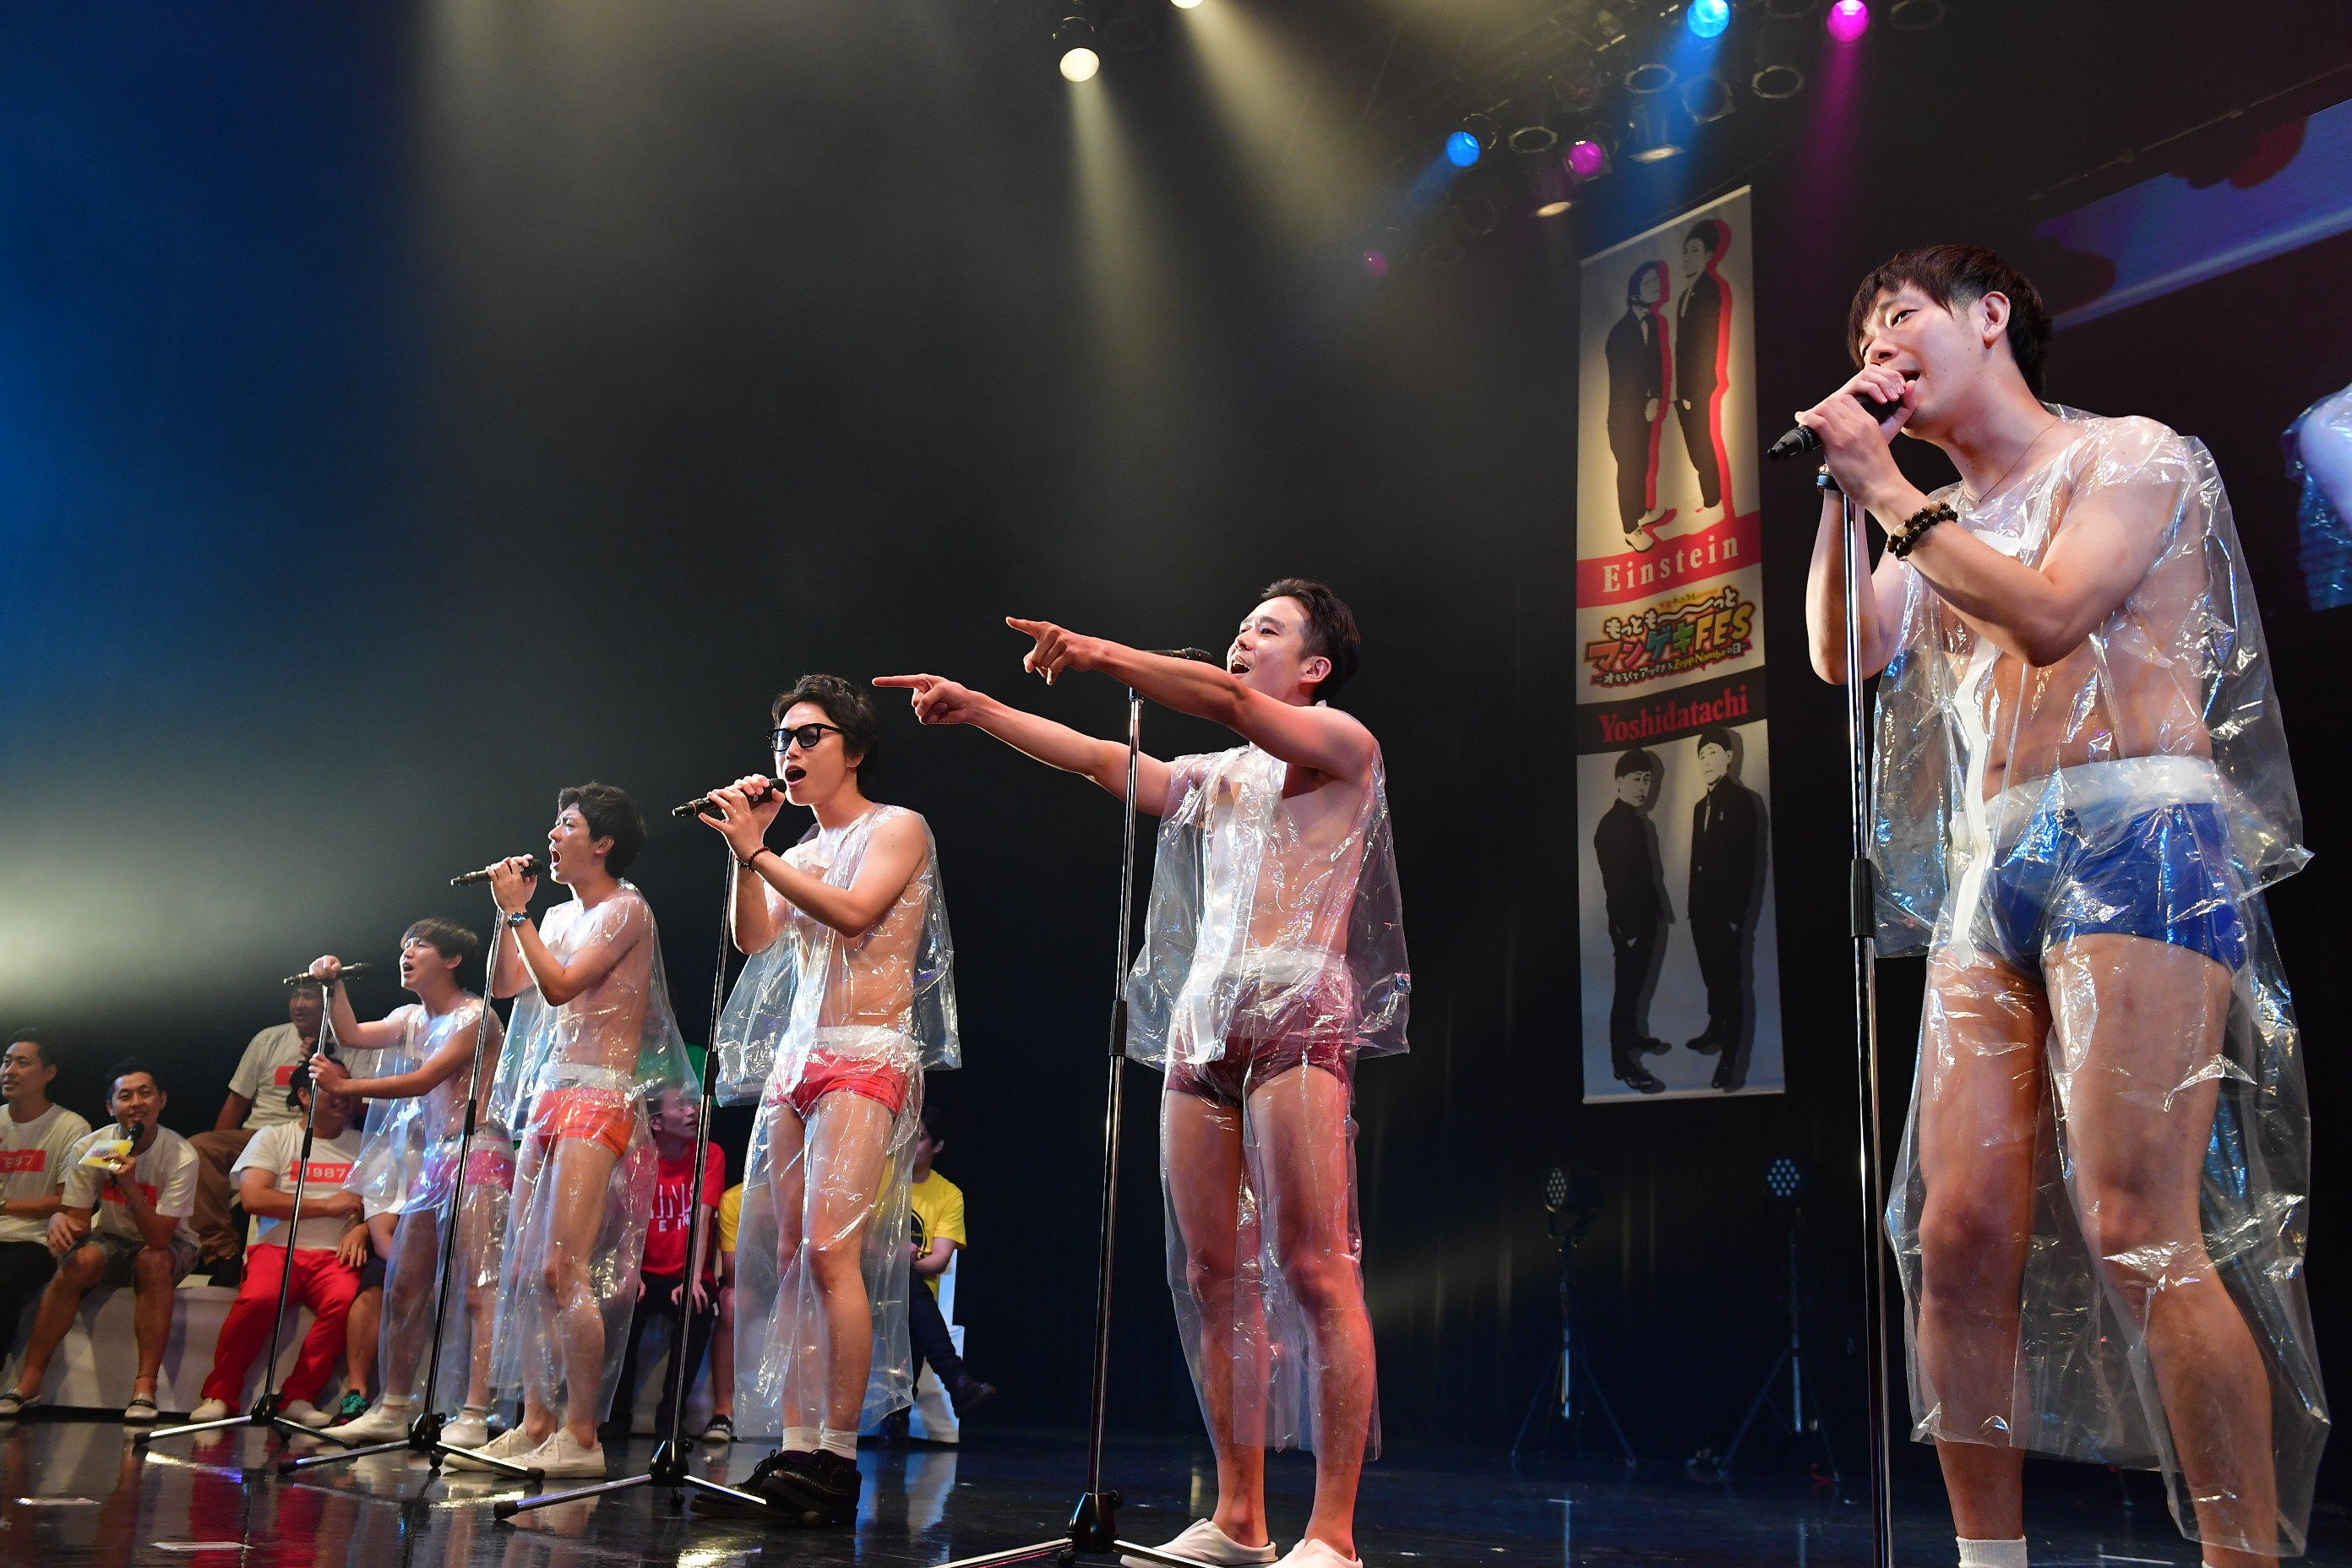 http://news.yoshimoto.co.jp/20180803011855-e81f3a9567dd78afcde157144df83efc51634a20.jpg